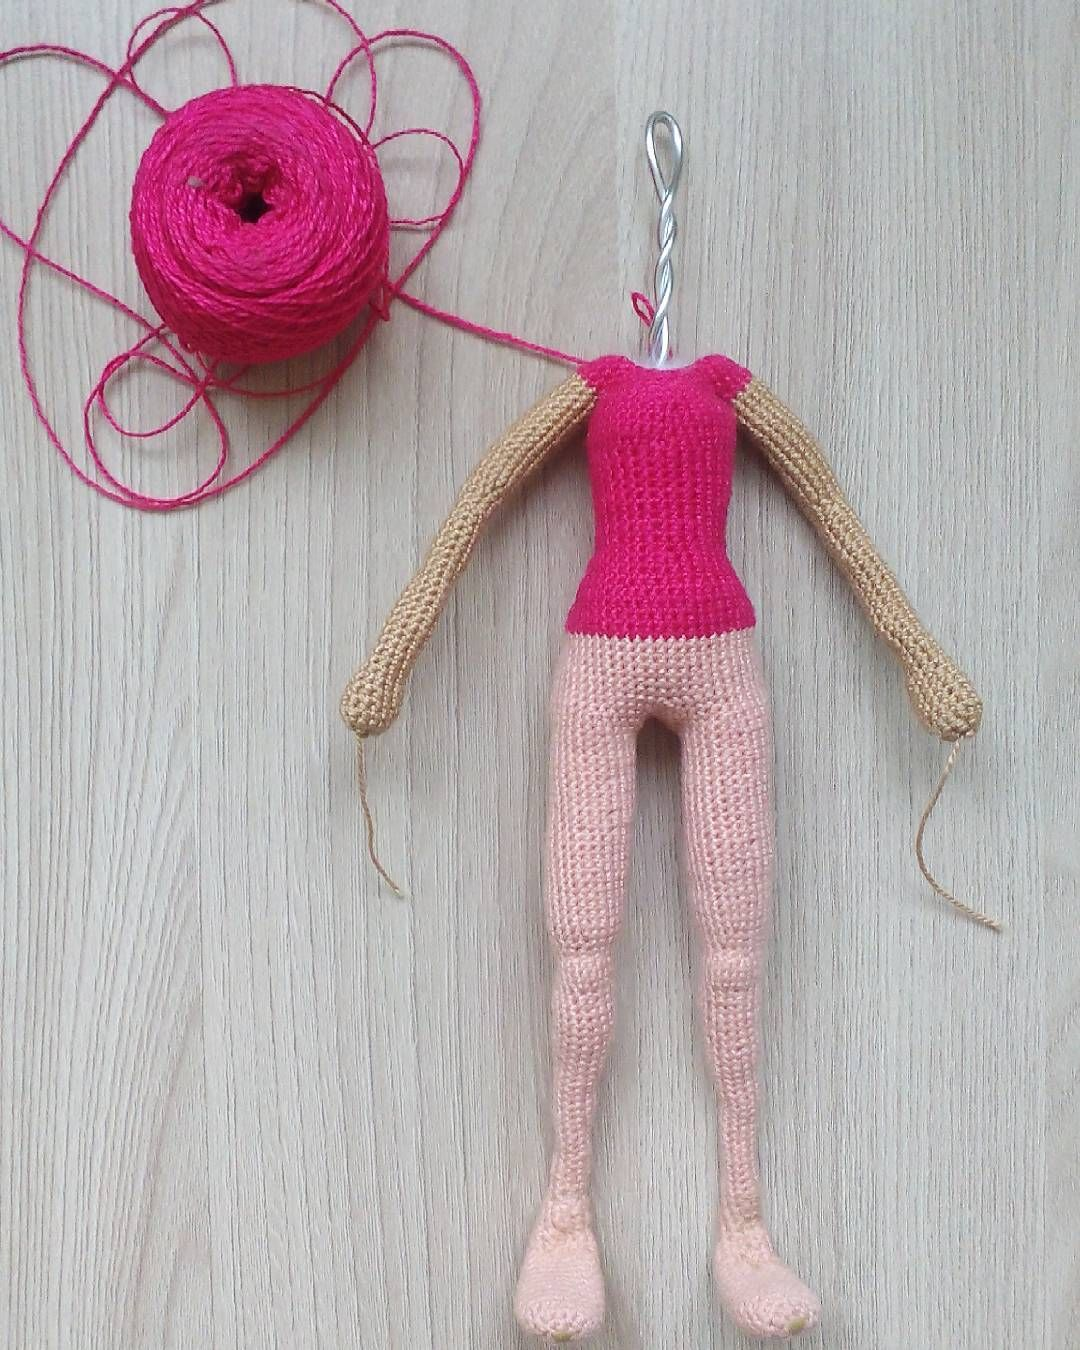 Pin de Natalka en Вязаные куколки   Pinterest   Muñecas, Ganchillo y ...